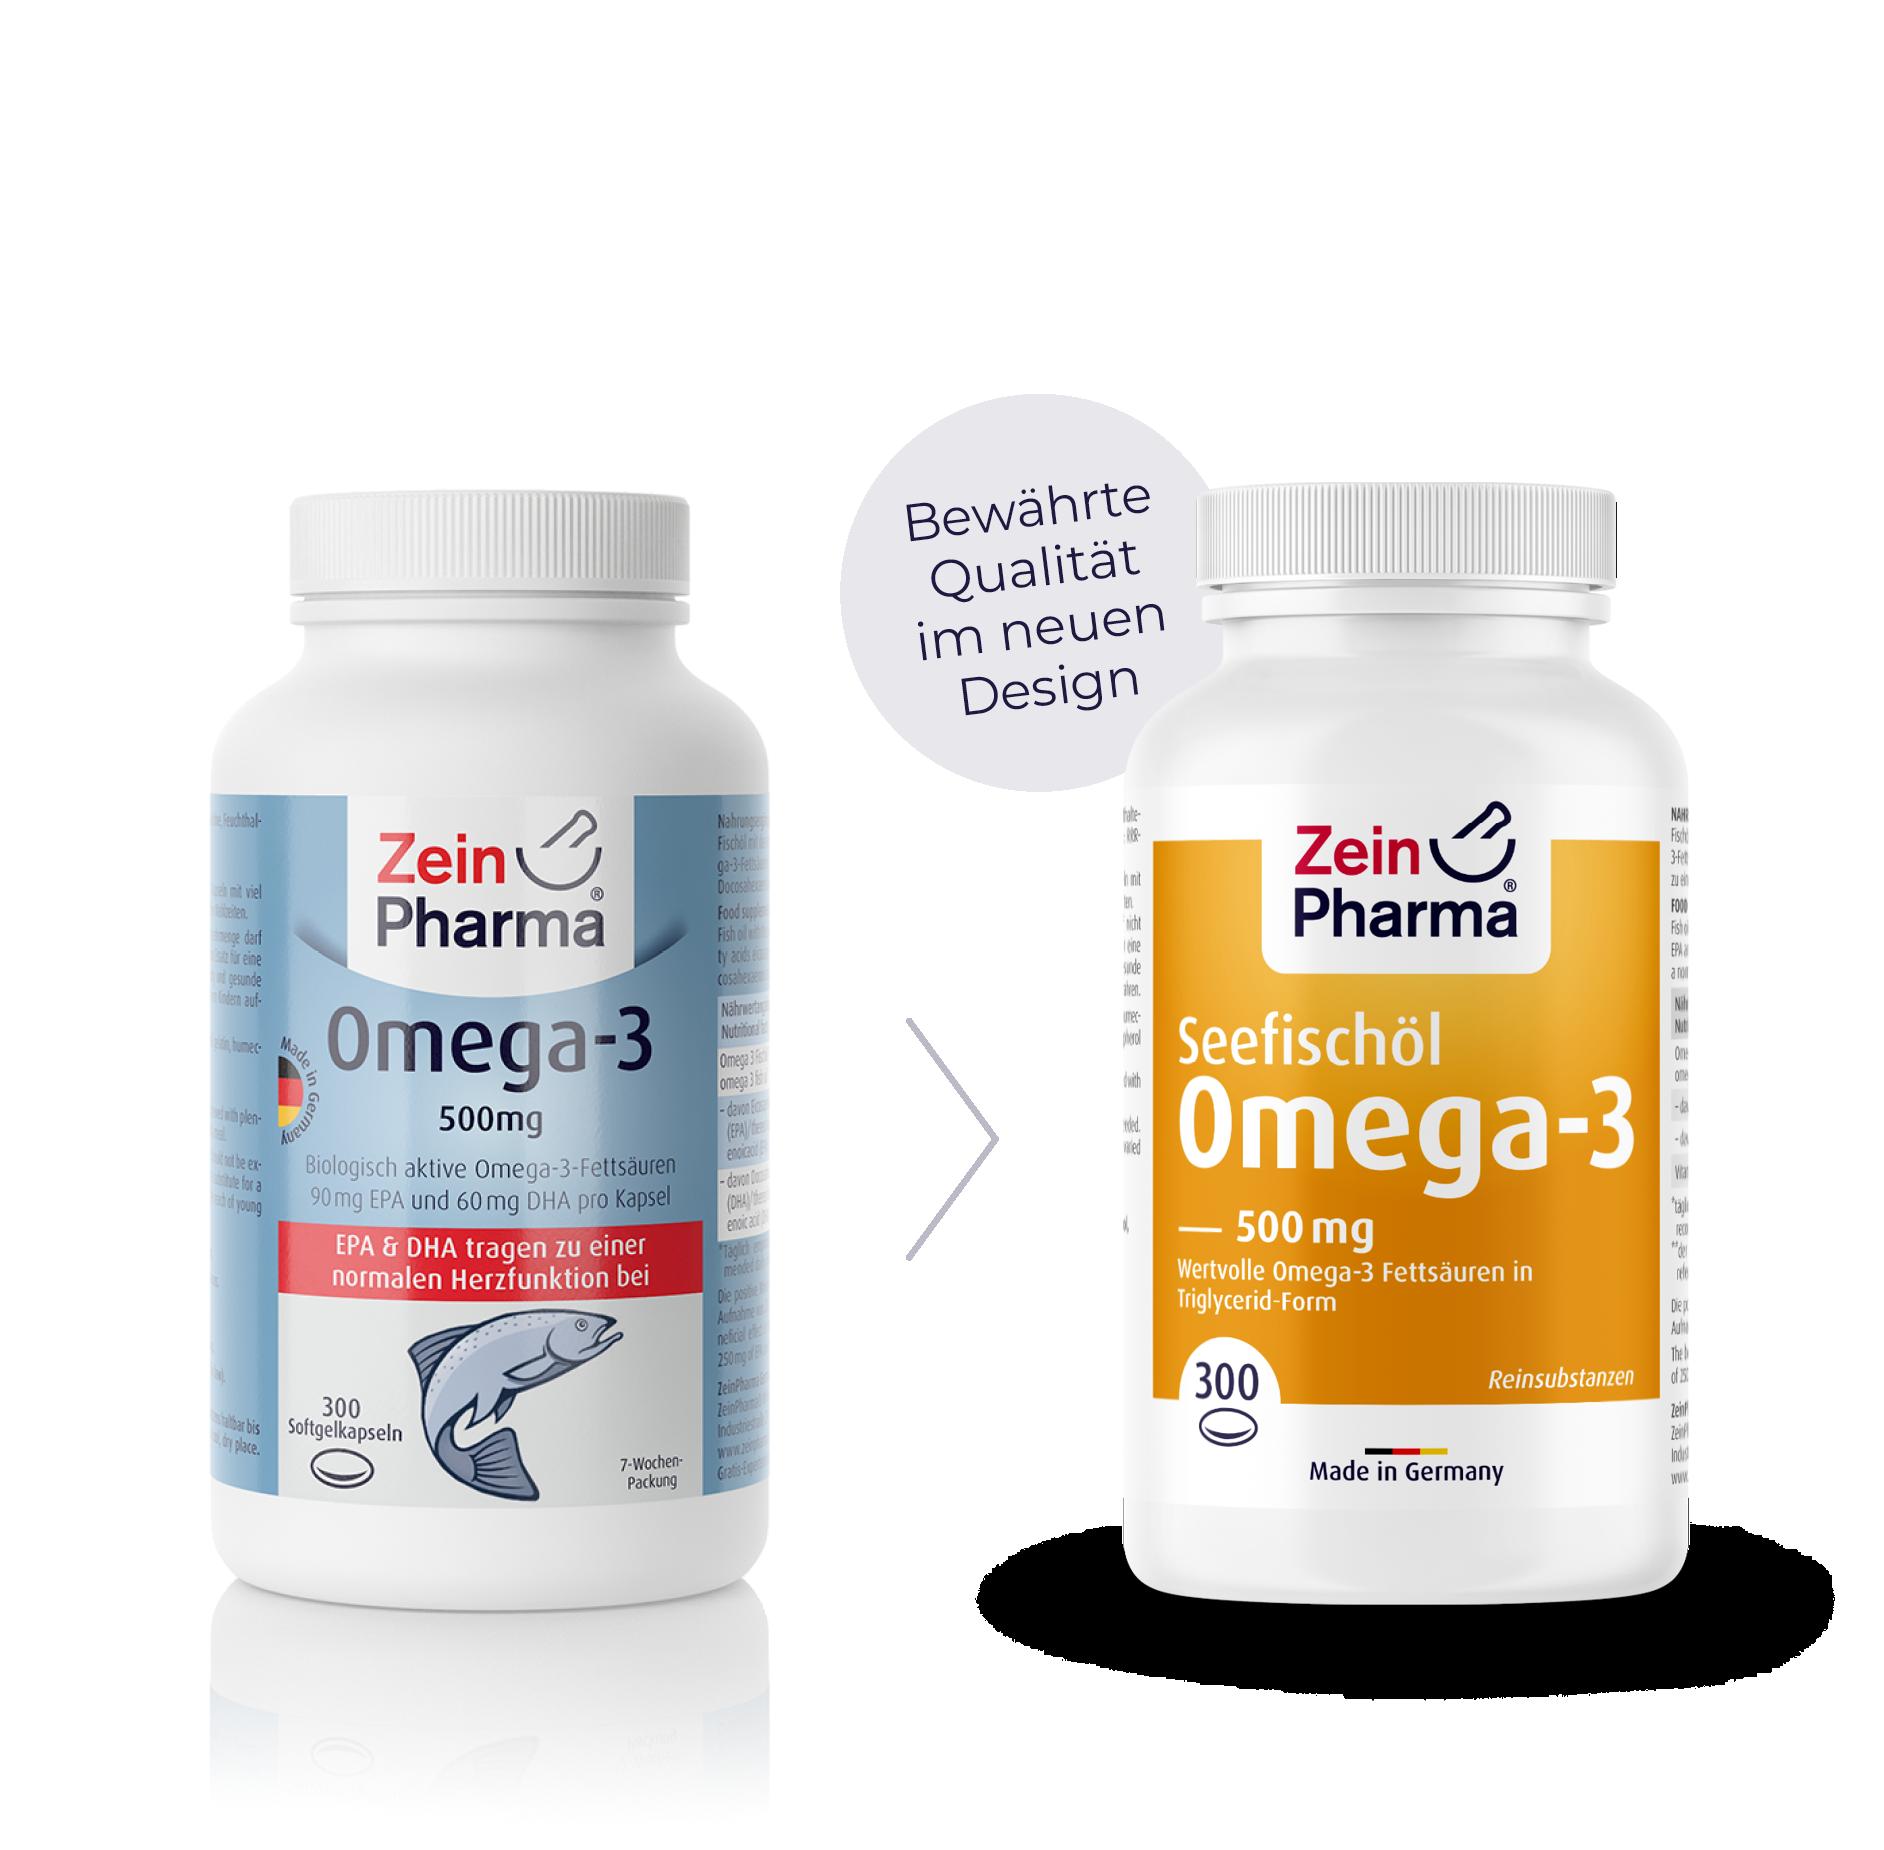 Omega-3 Seefischöl Softgel-Kapseln 500 mg